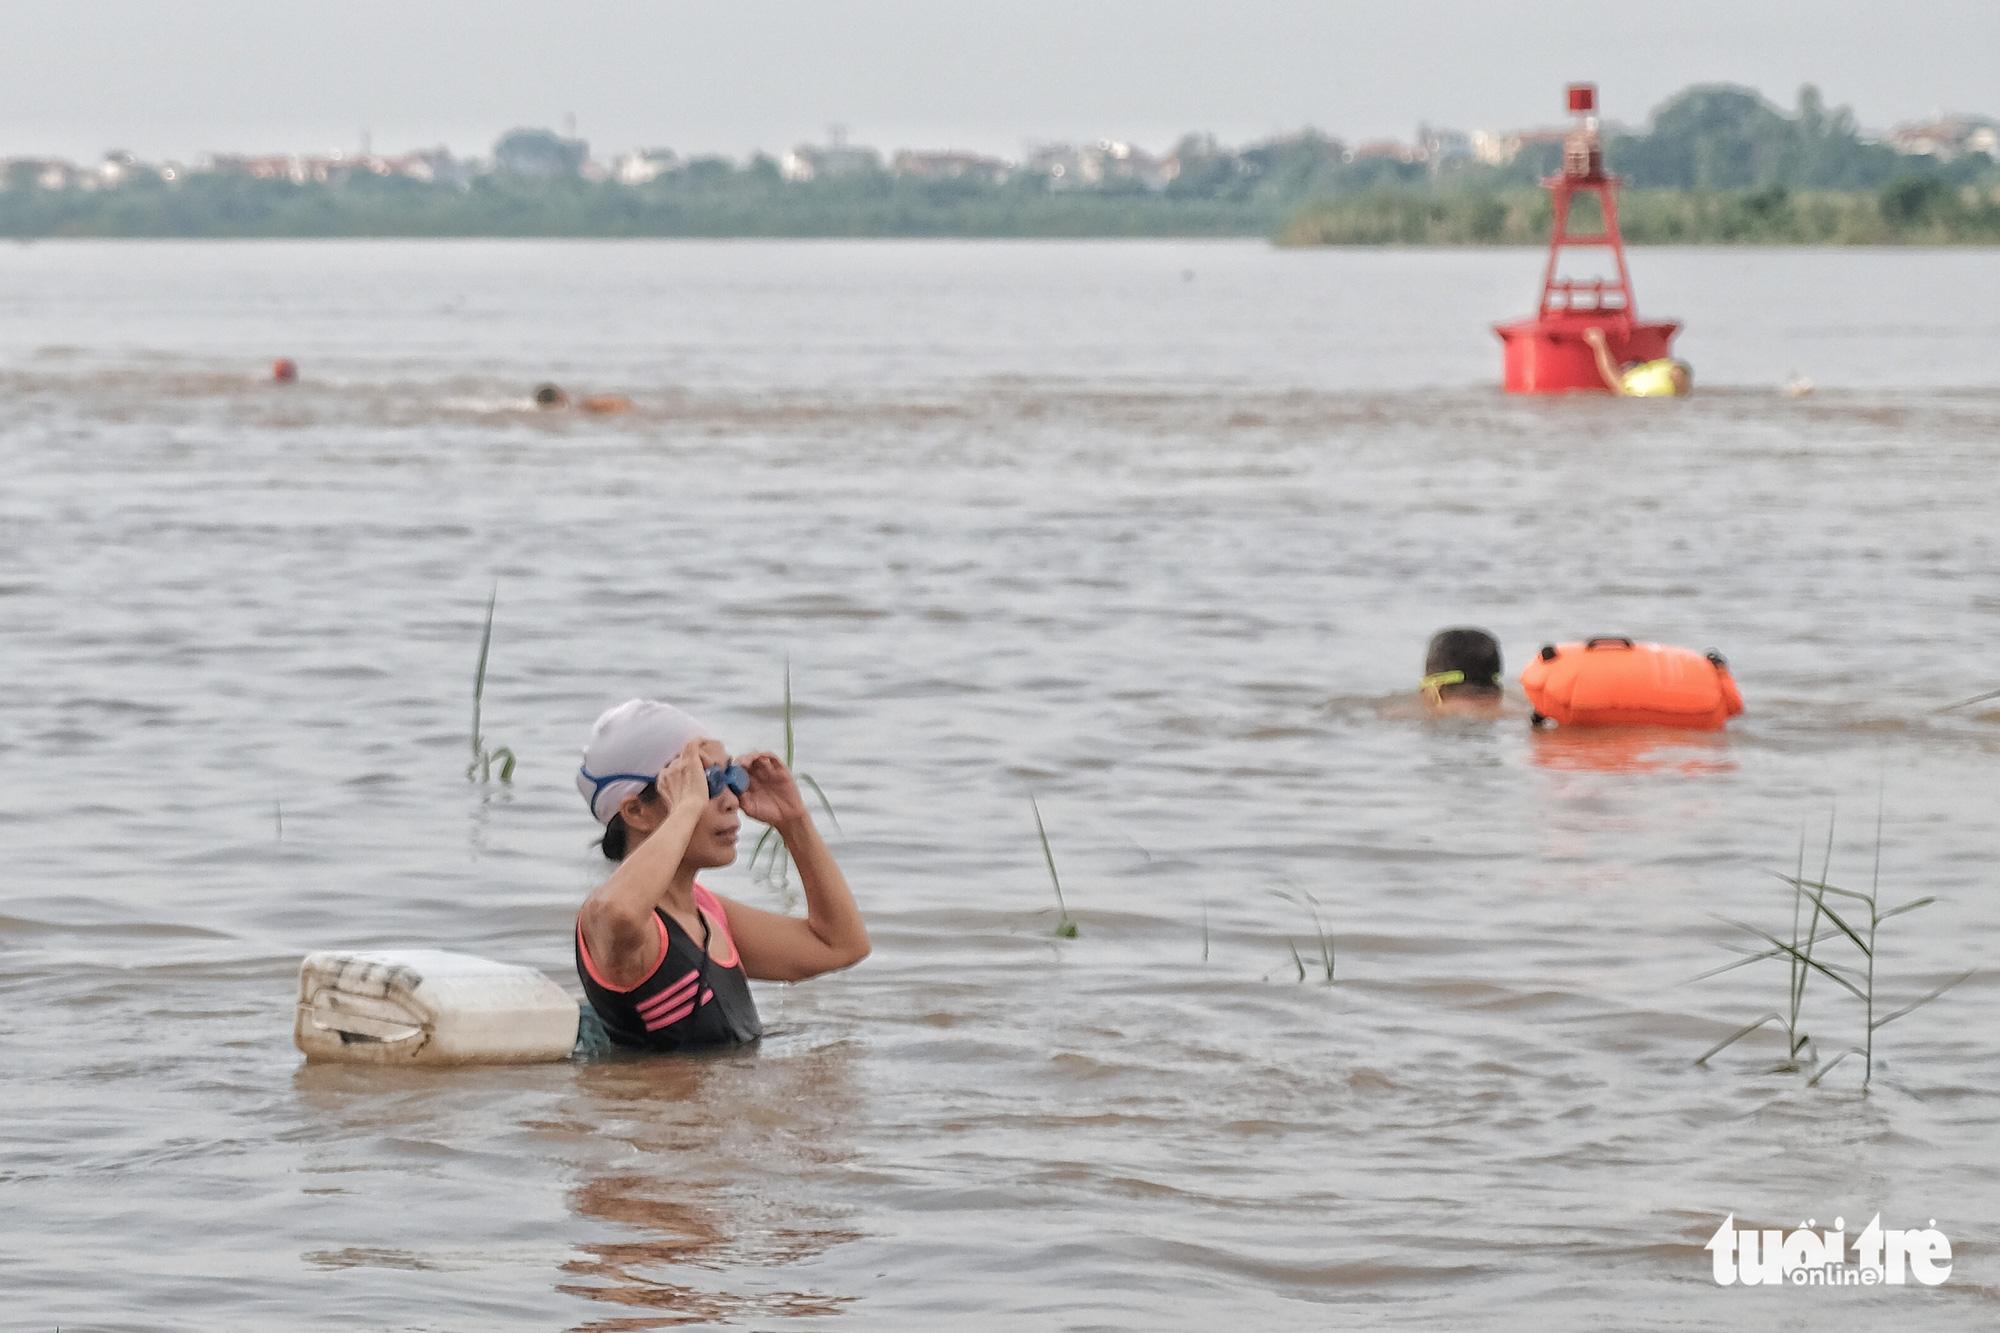 Hanoi residents swim in Red River despite rising water